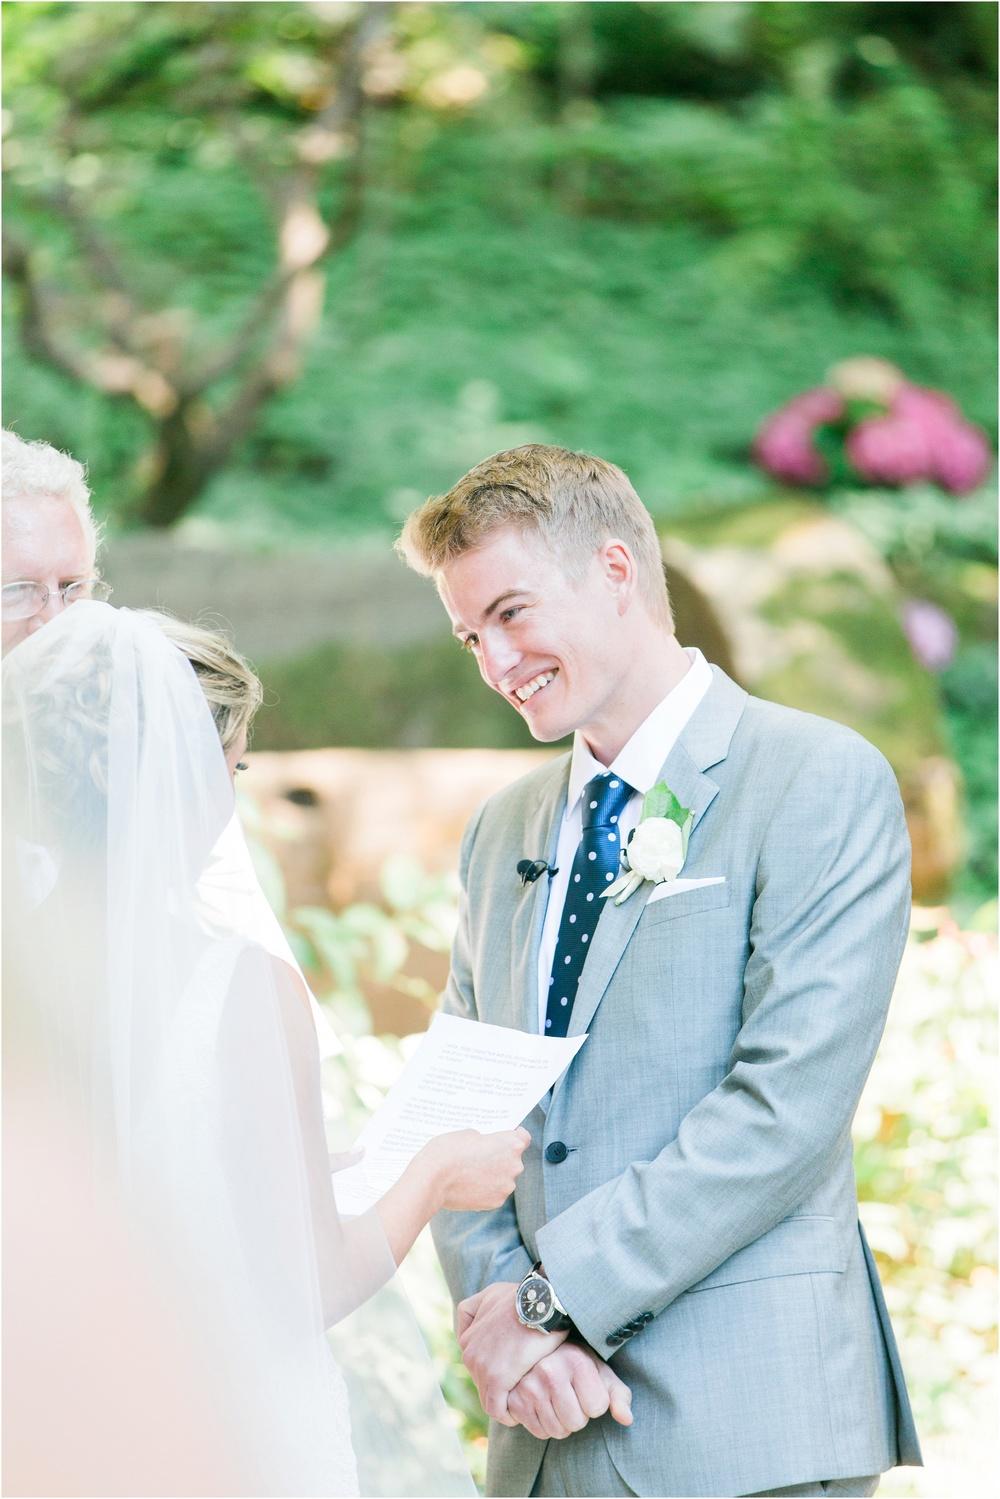 Nestldown_Rustic_Summer_Redwoods_Wedding- 028.jpg